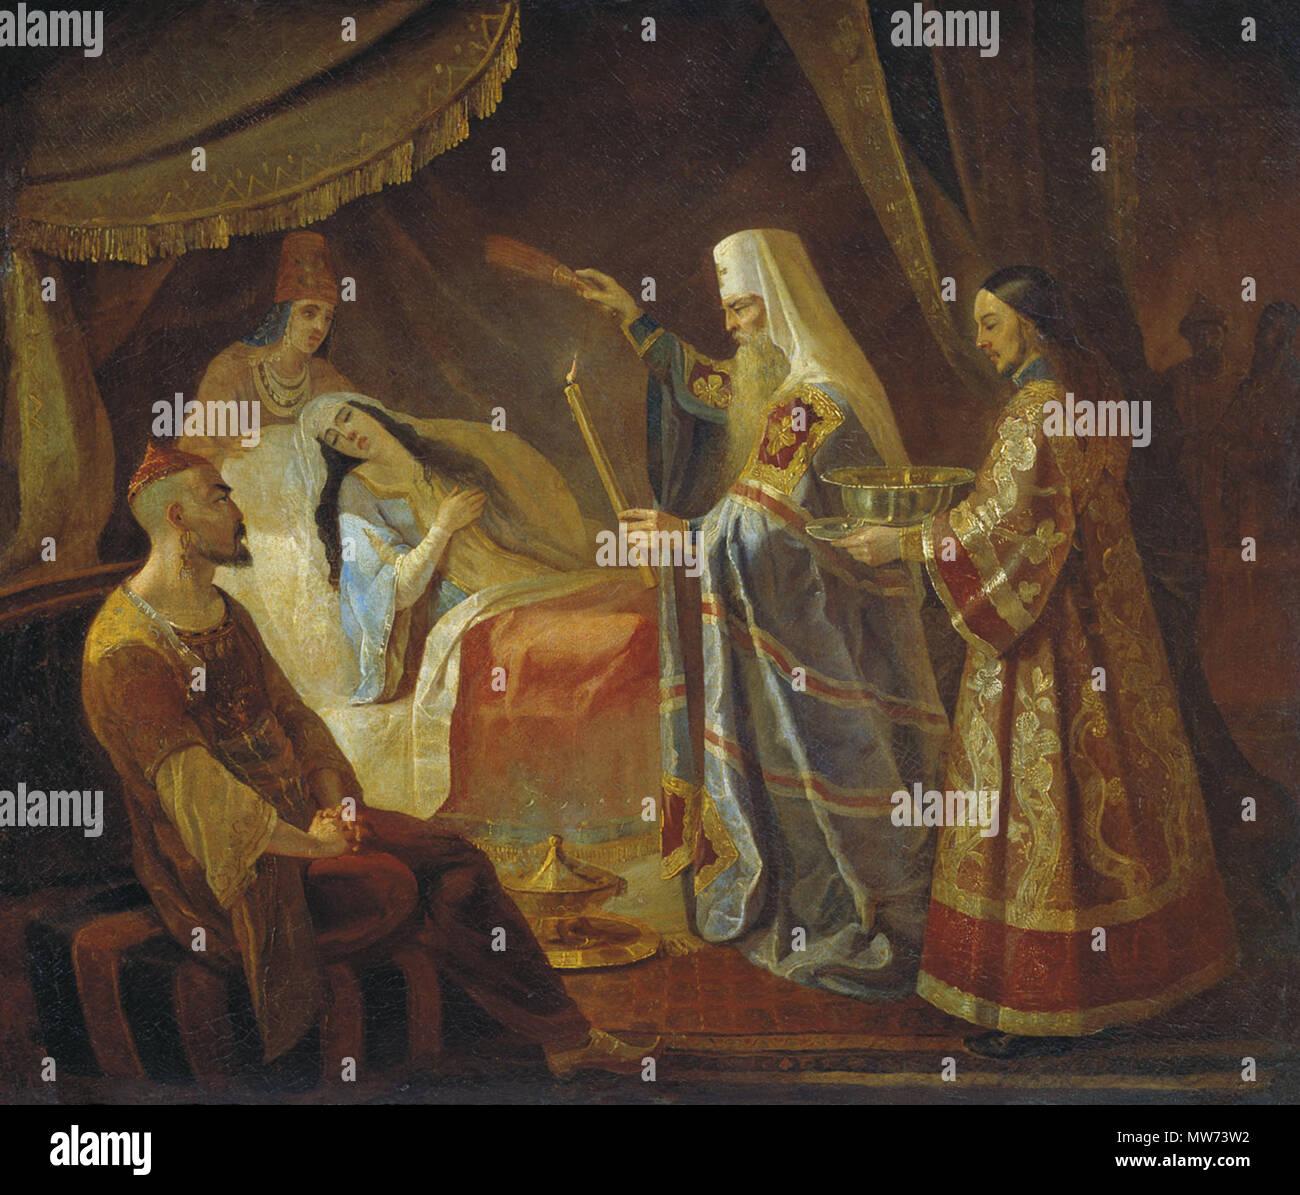 . Metropolitan Alexis Healing the Tatar Tsarina Taidula from Blindness . 19th century. Yakov Kapkov (1816-54) 34 Alessio-Kapkov Stock Photo